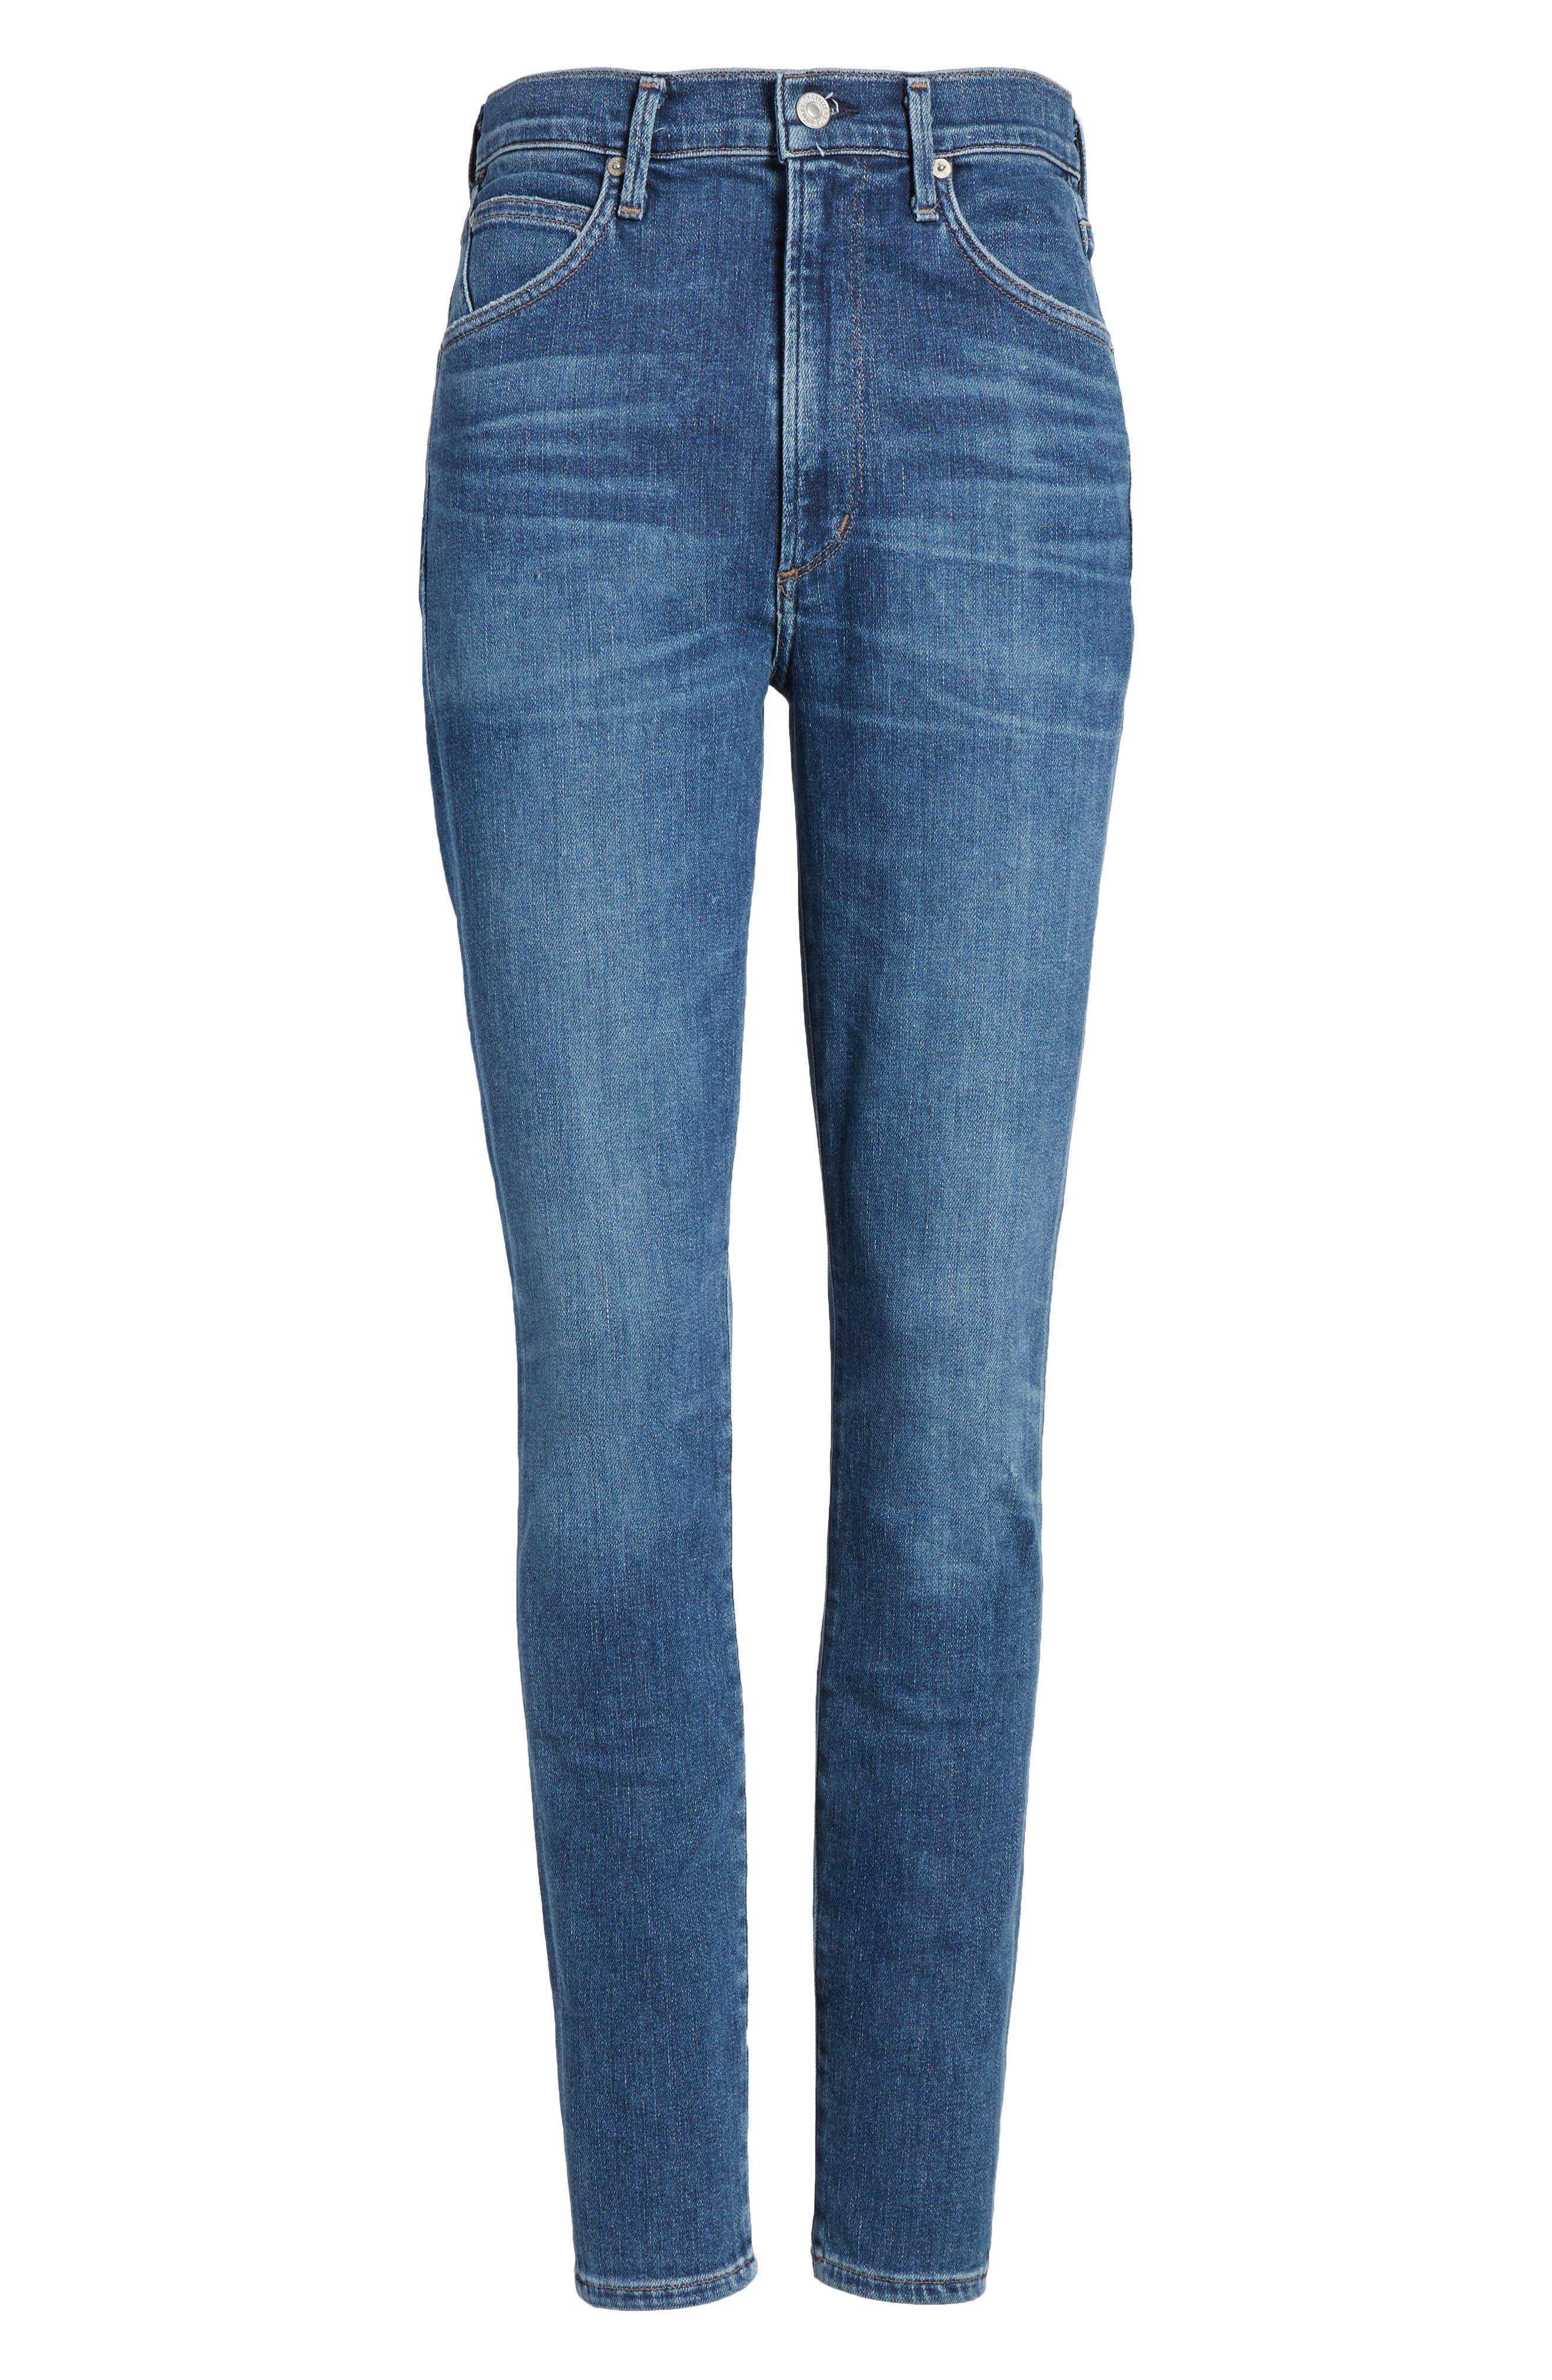 Chrissy High Waist Skinny Jeans,                             Alternate thumbnail 6, color,                             455